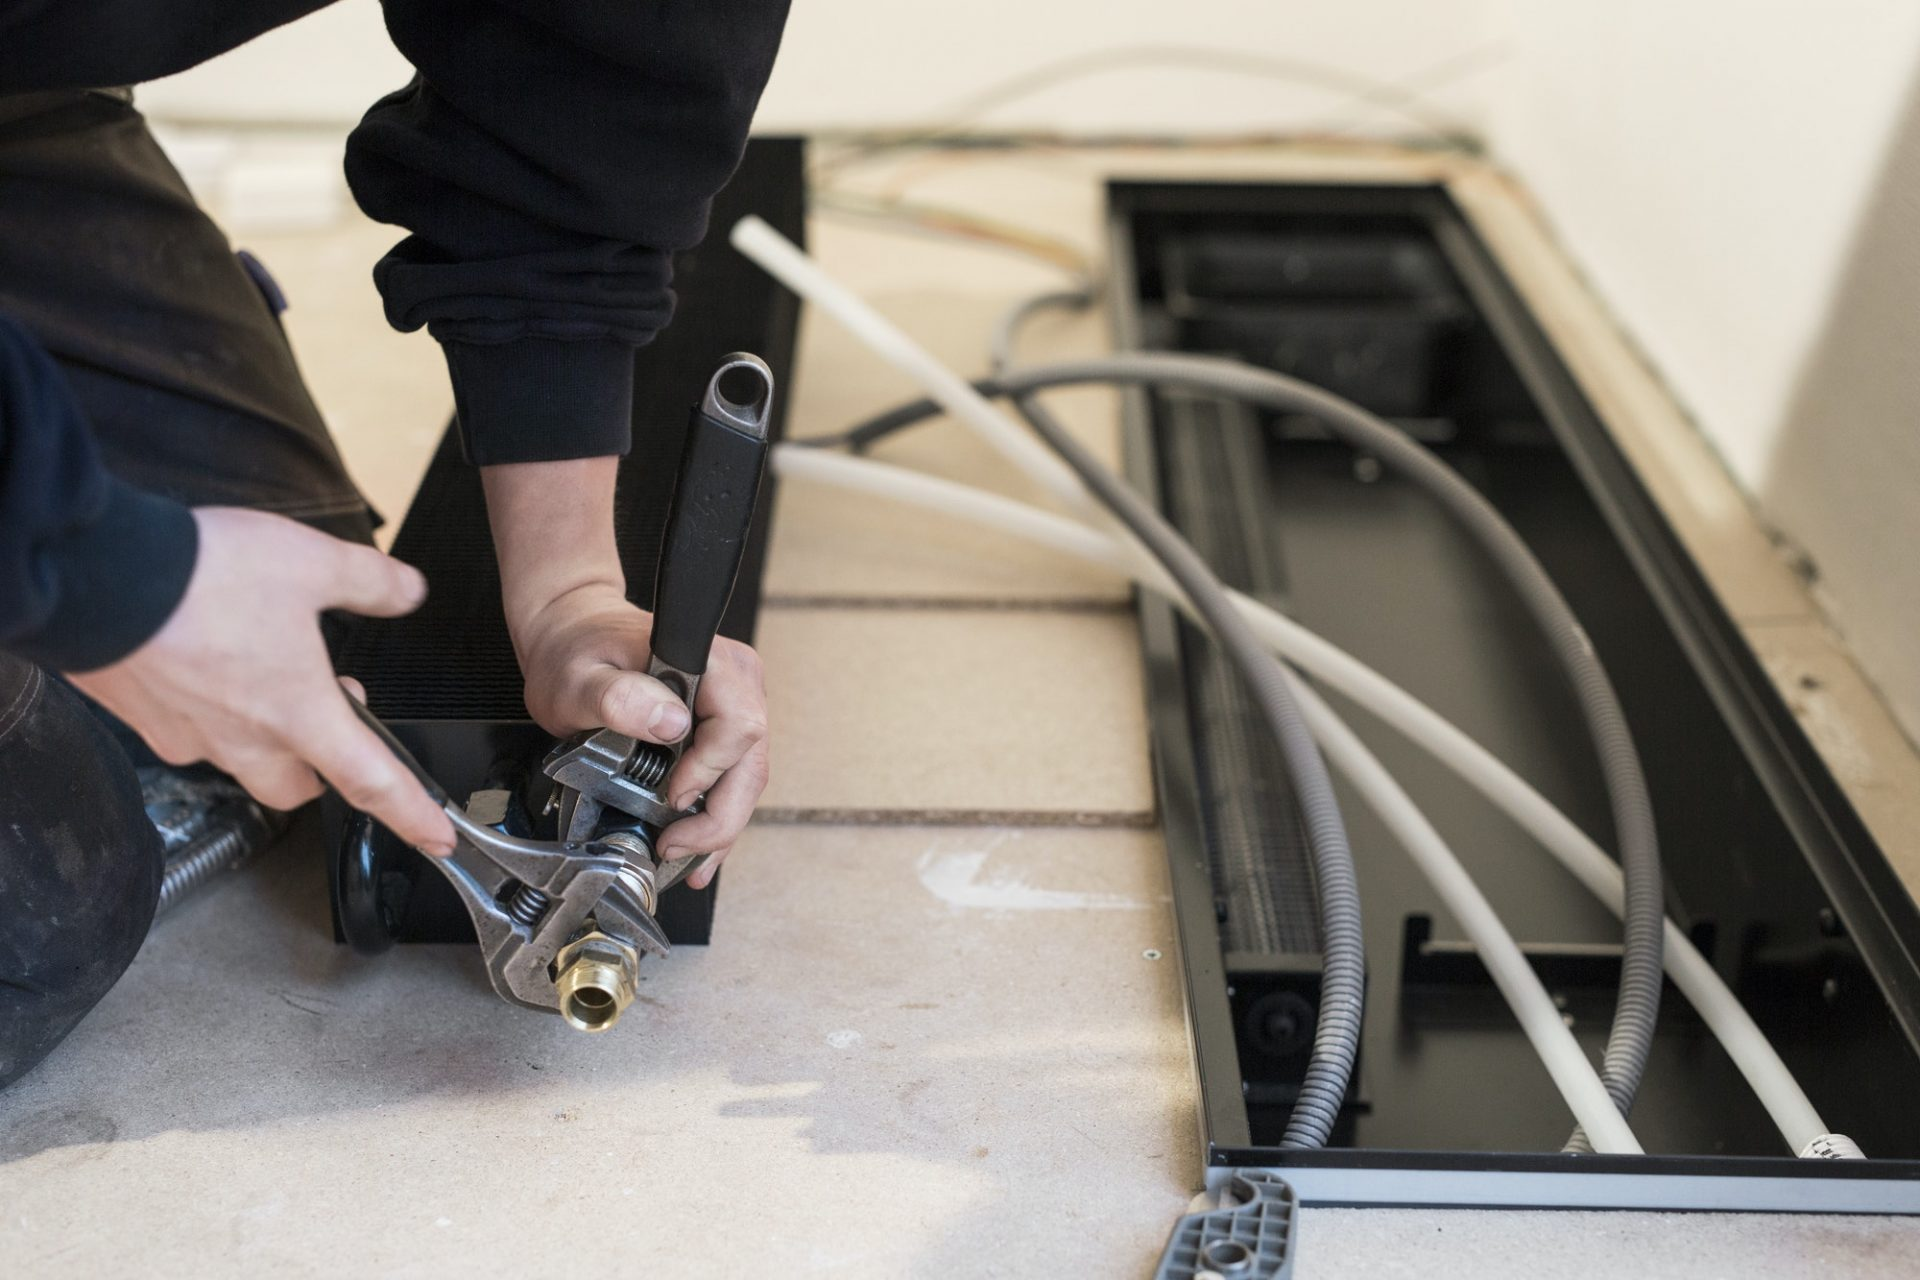 Close-up of repairman working